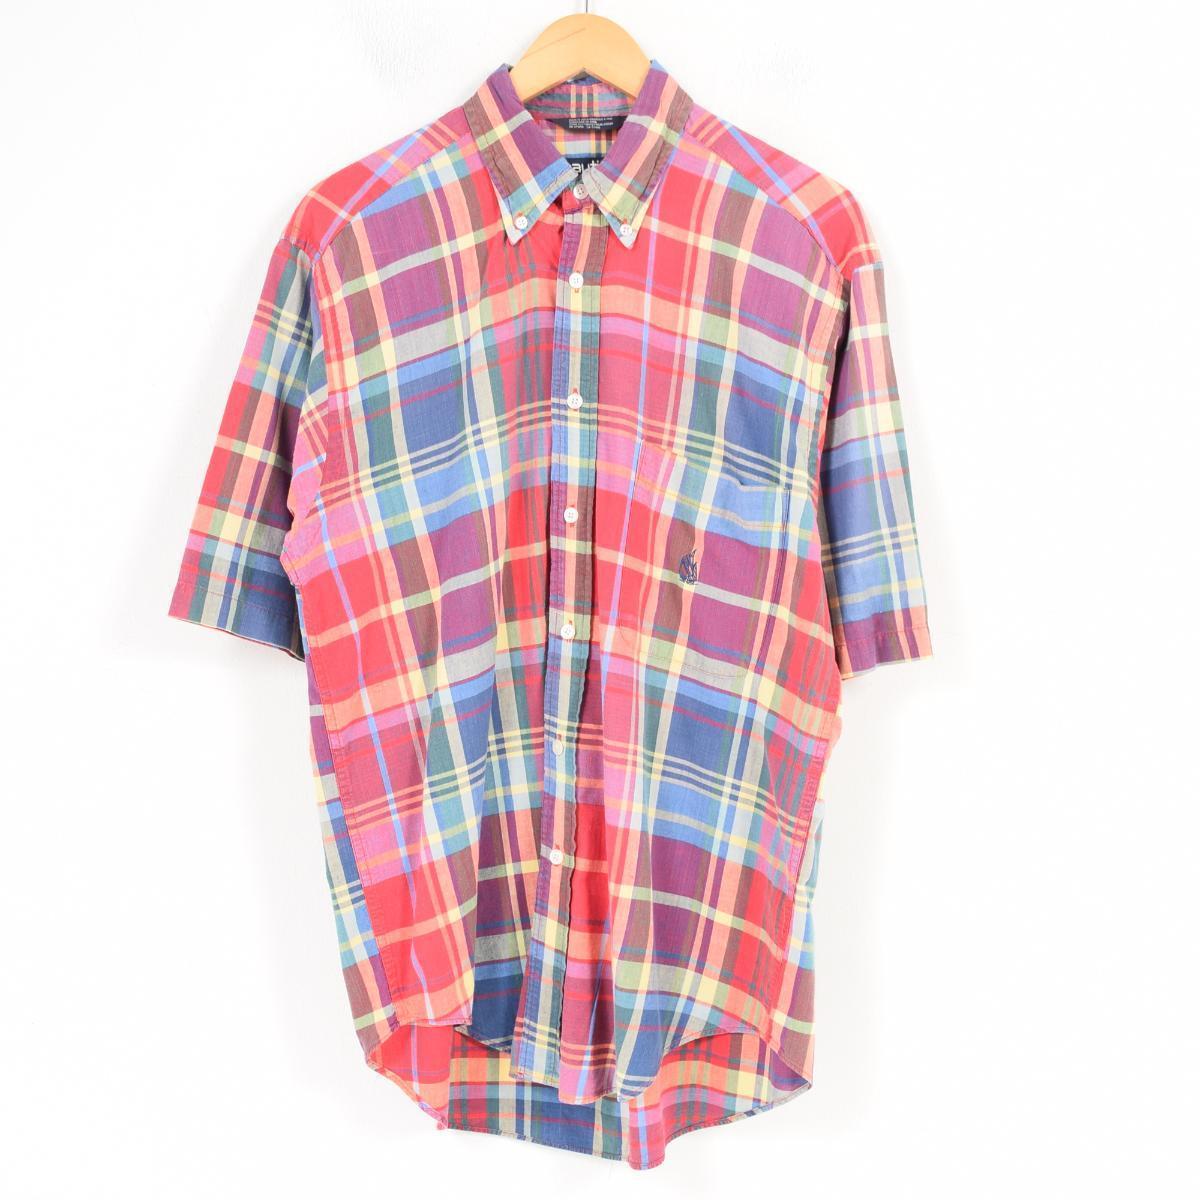 Vintage Clothing Jam 90s Nautica Nautica Short Sleeves Check Shirt